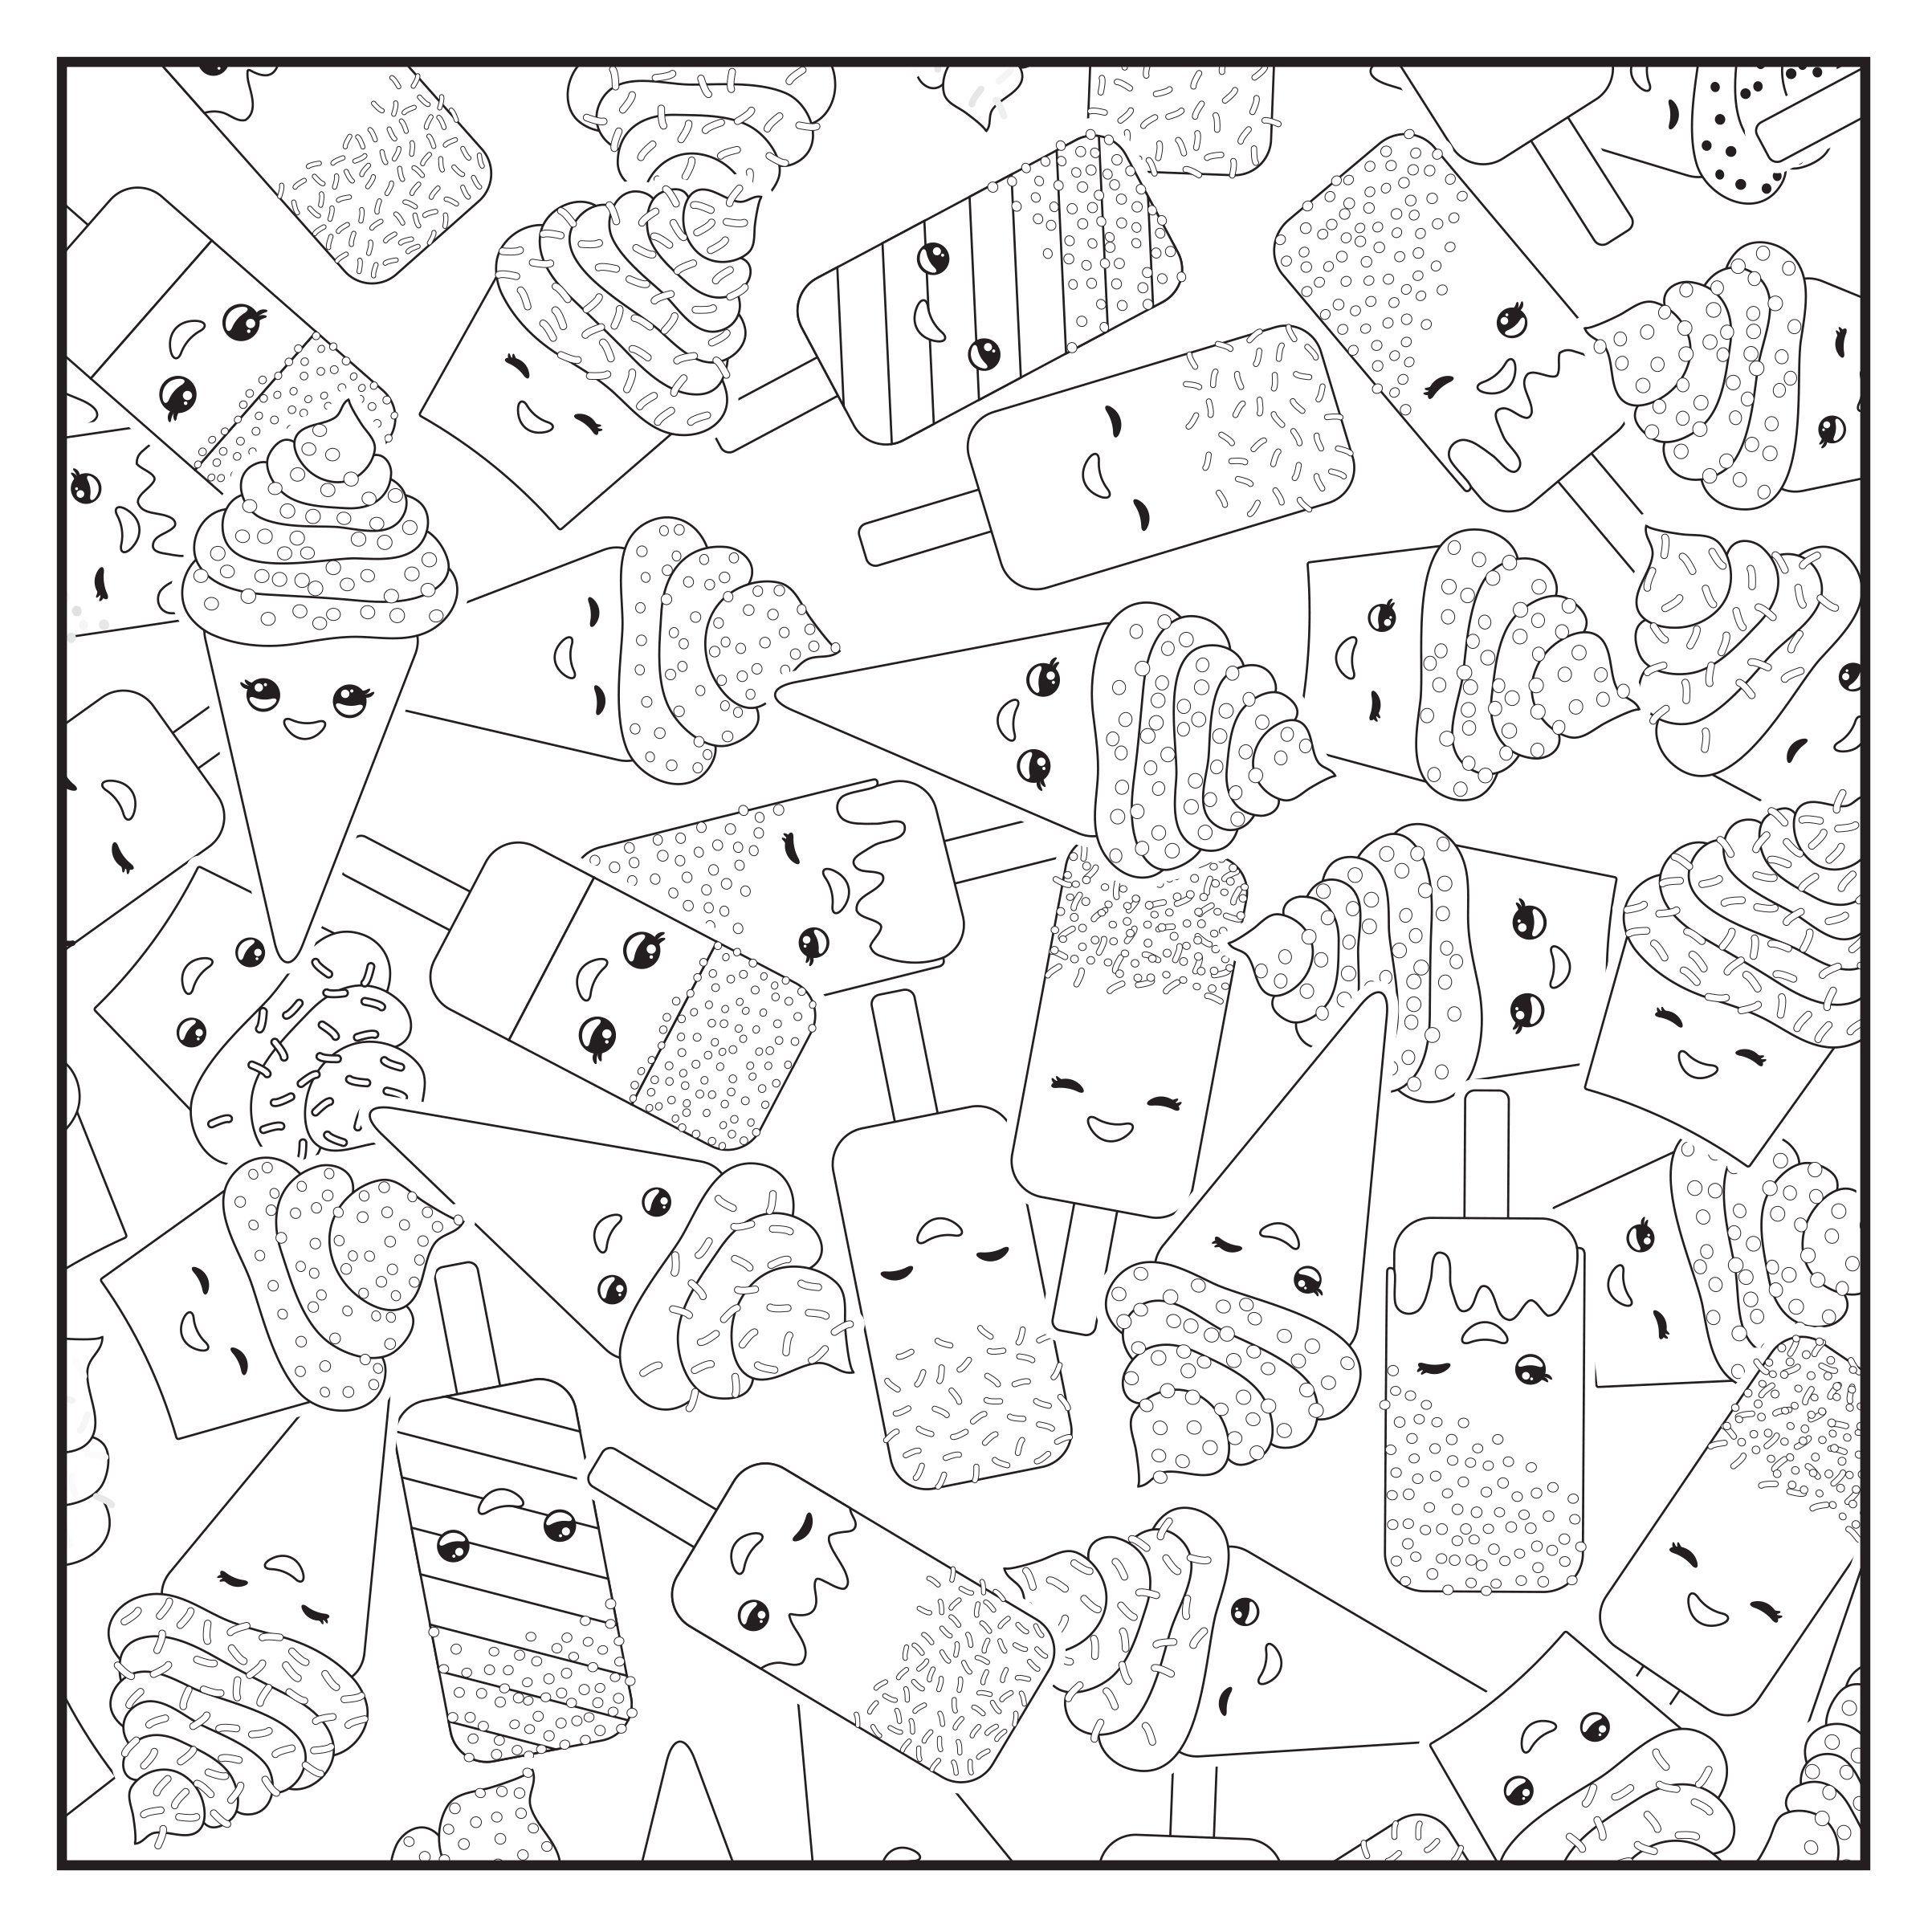 Amazon.com: Emoji Crazy Fun Adult Coloring Book and Teens Coloring ...